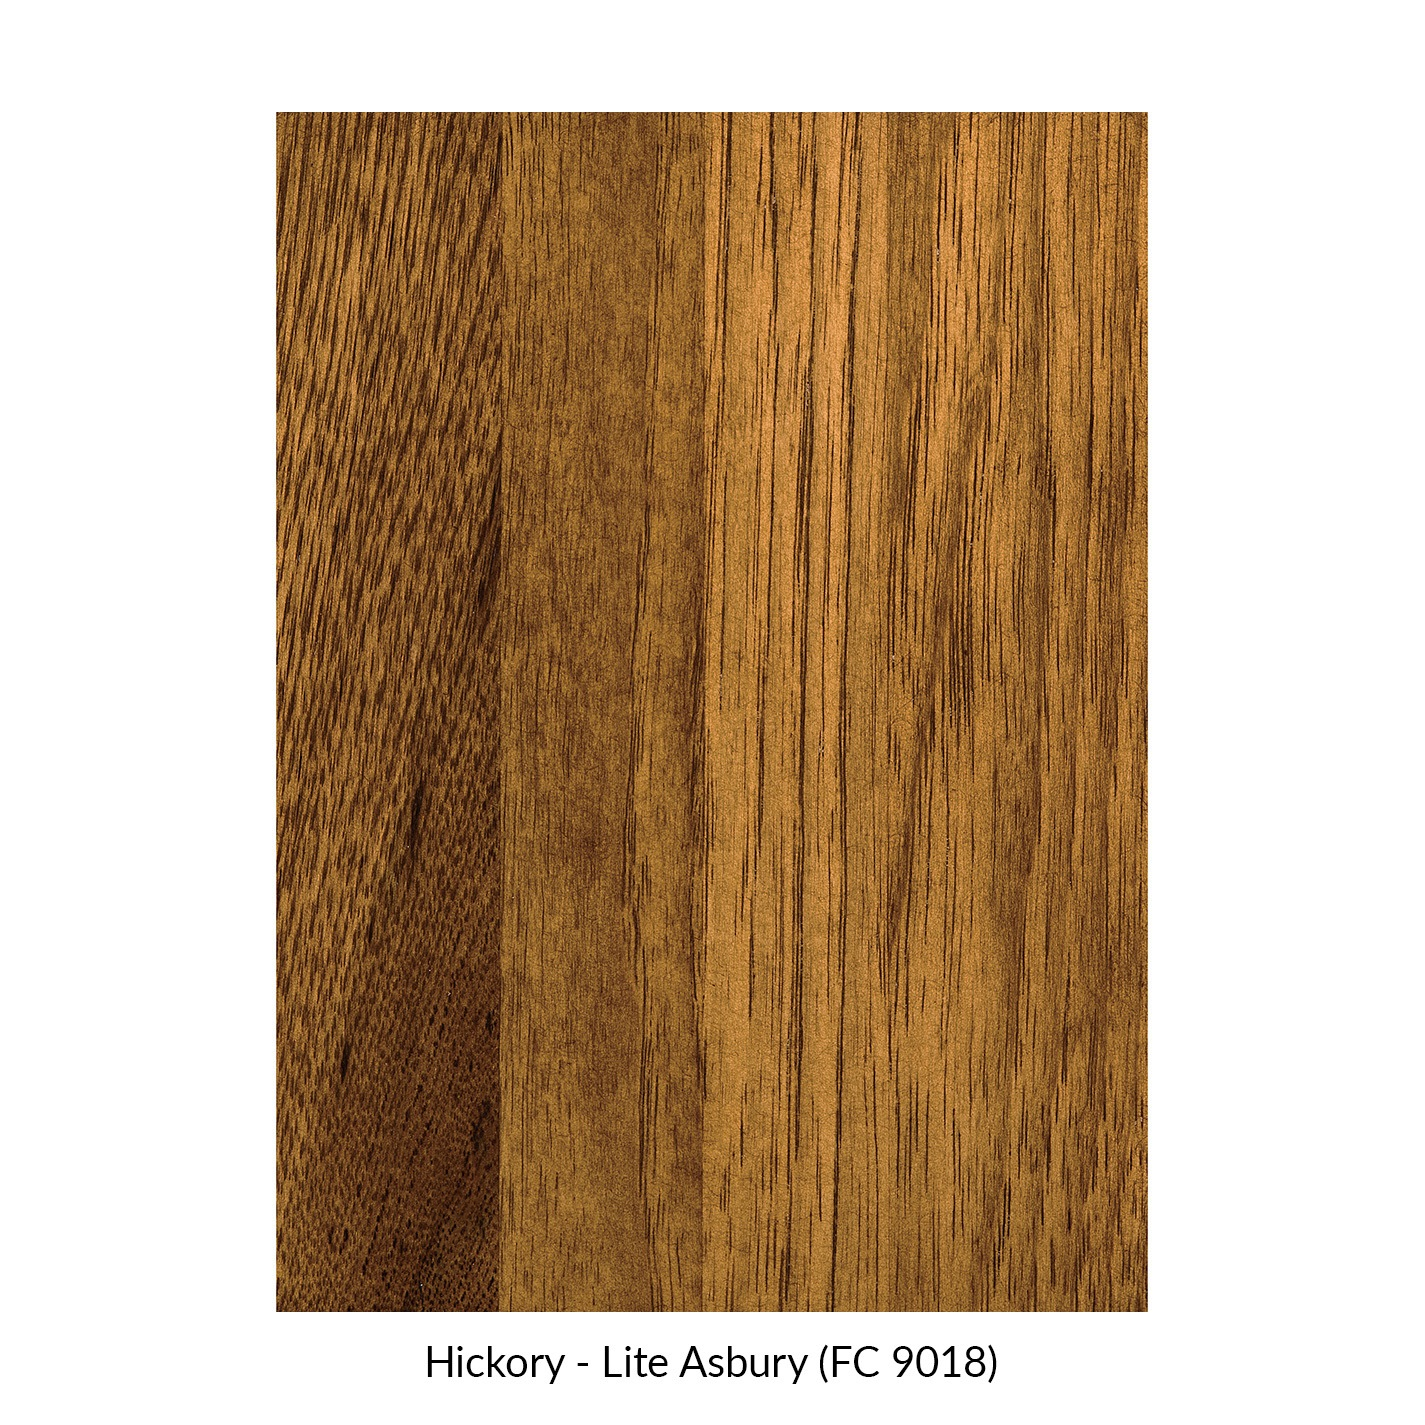 spectrum-hickory-lite-asbury-fc-9018.jpg